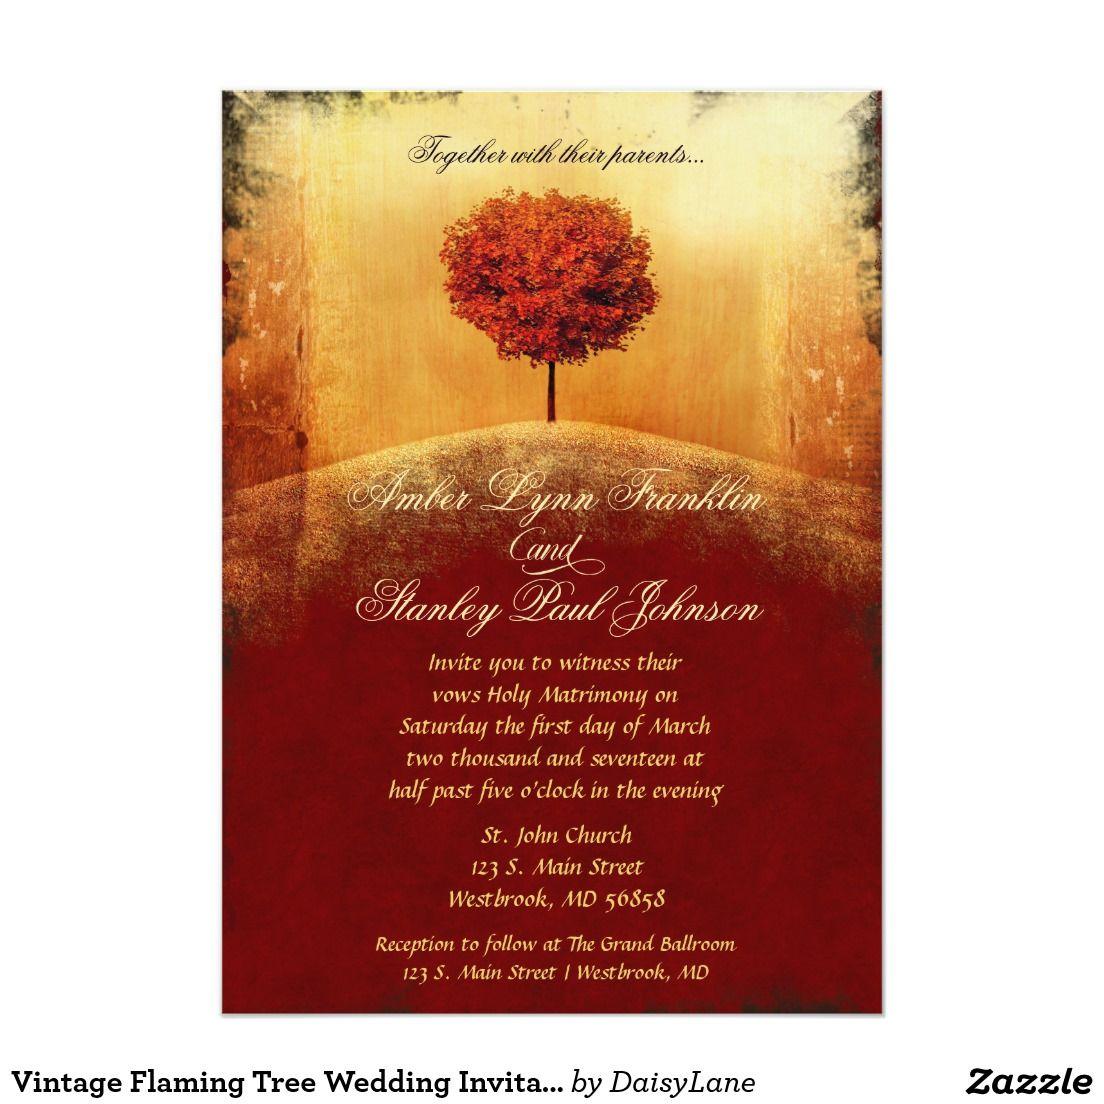 Vintage Flaming Tree Wedding Invitation | Baby invitations and Wedding